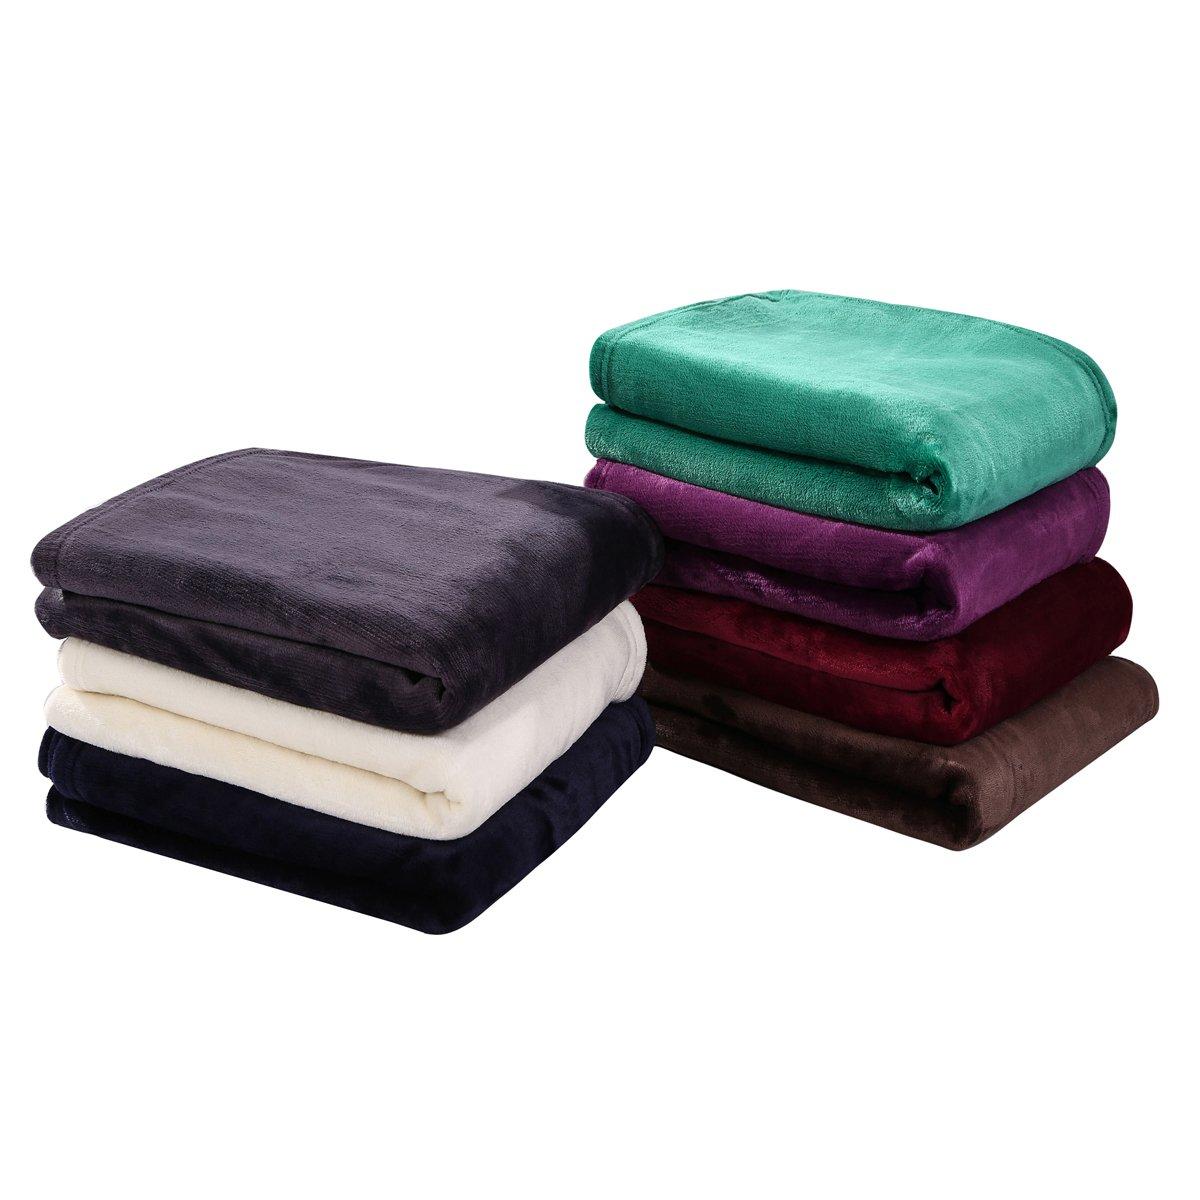 HYSEAS Velvet Plush Throw, Home Fleece Throw Blanket, 50 by 60-Inch, Teal